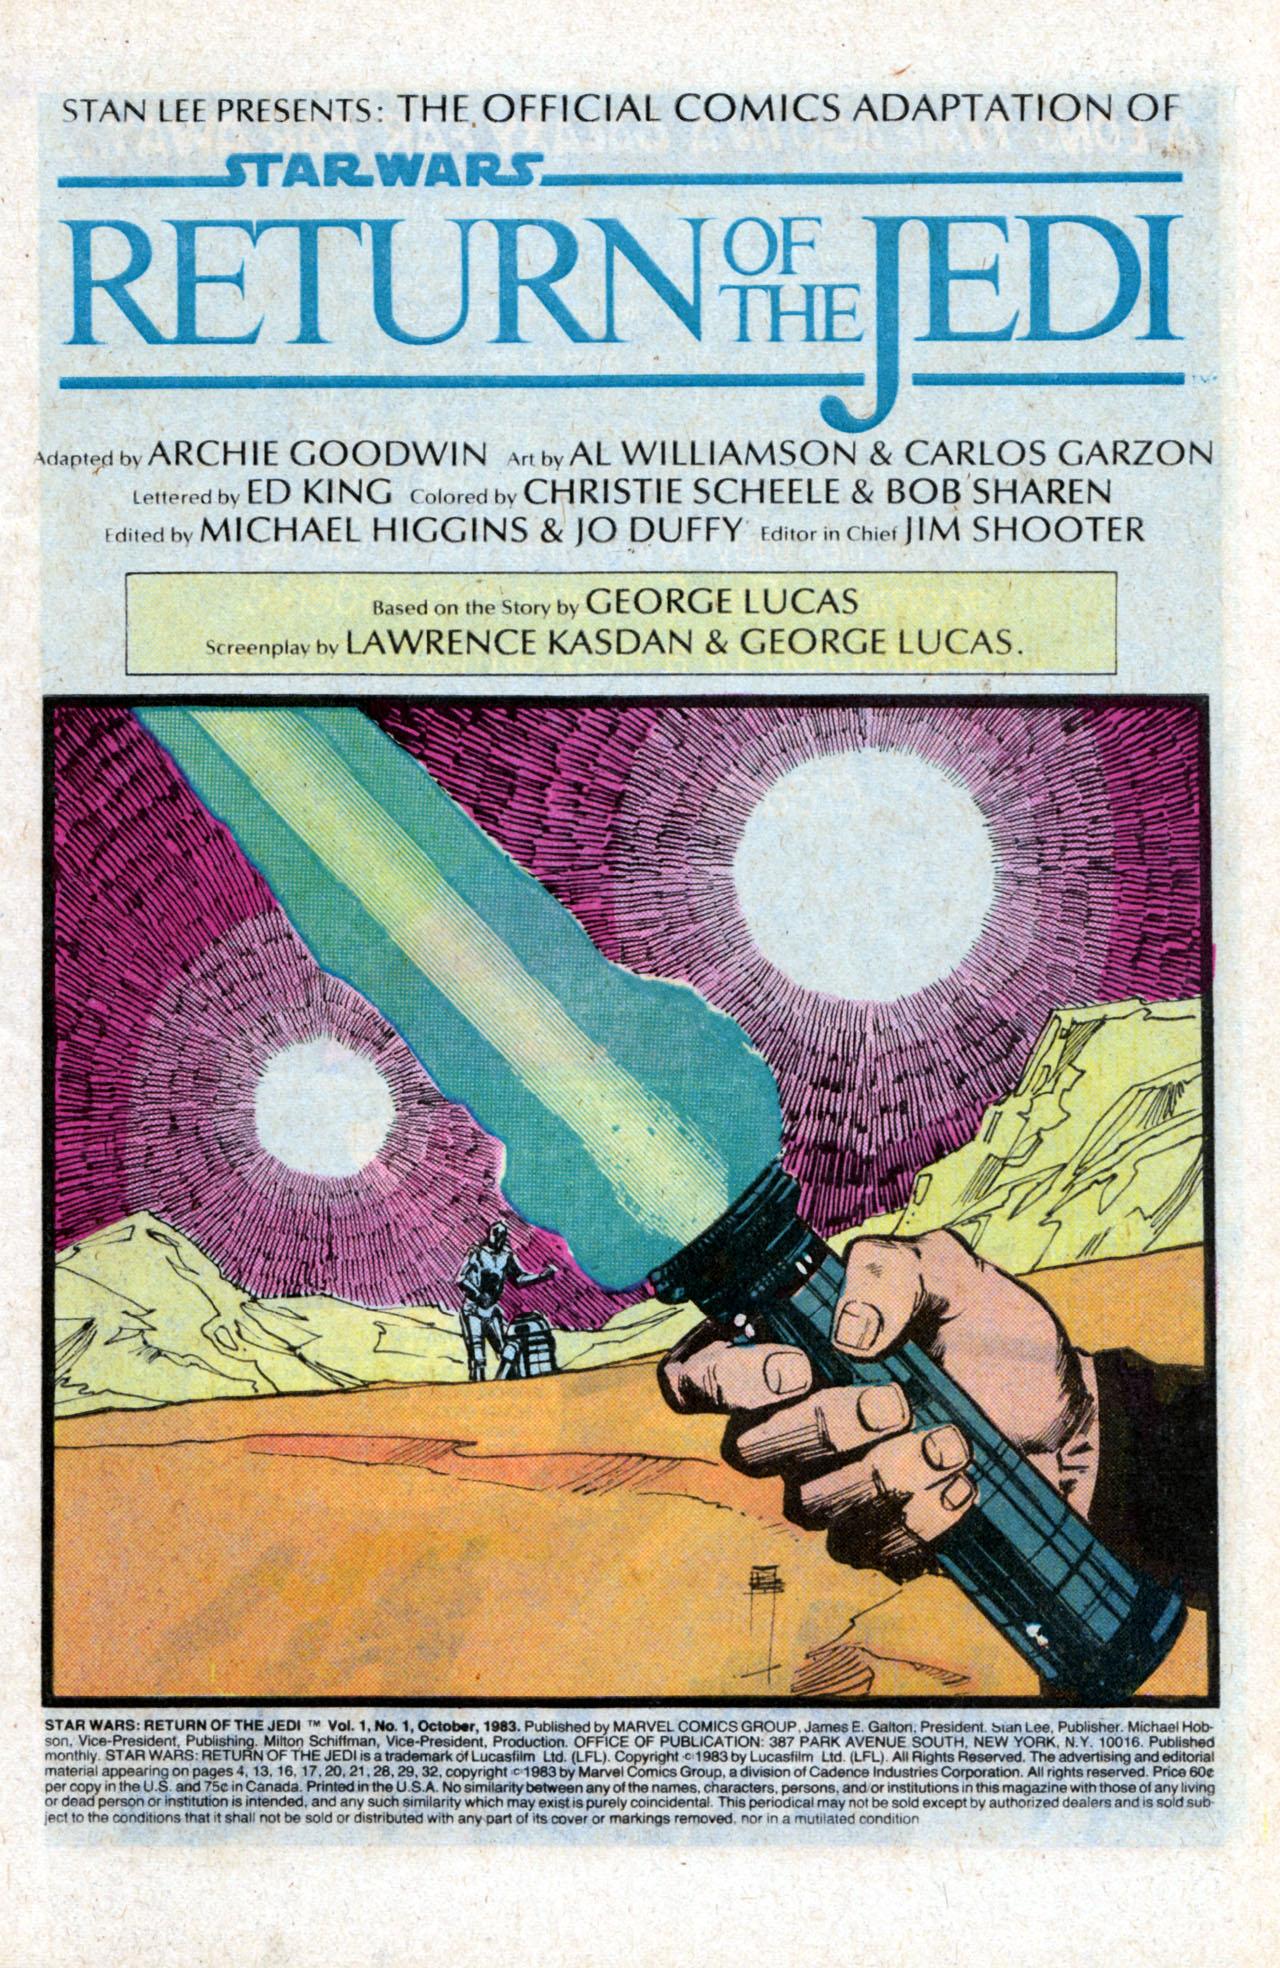 Read online Star Wars: Return of the Jedi comic -  Issue #1 - 3